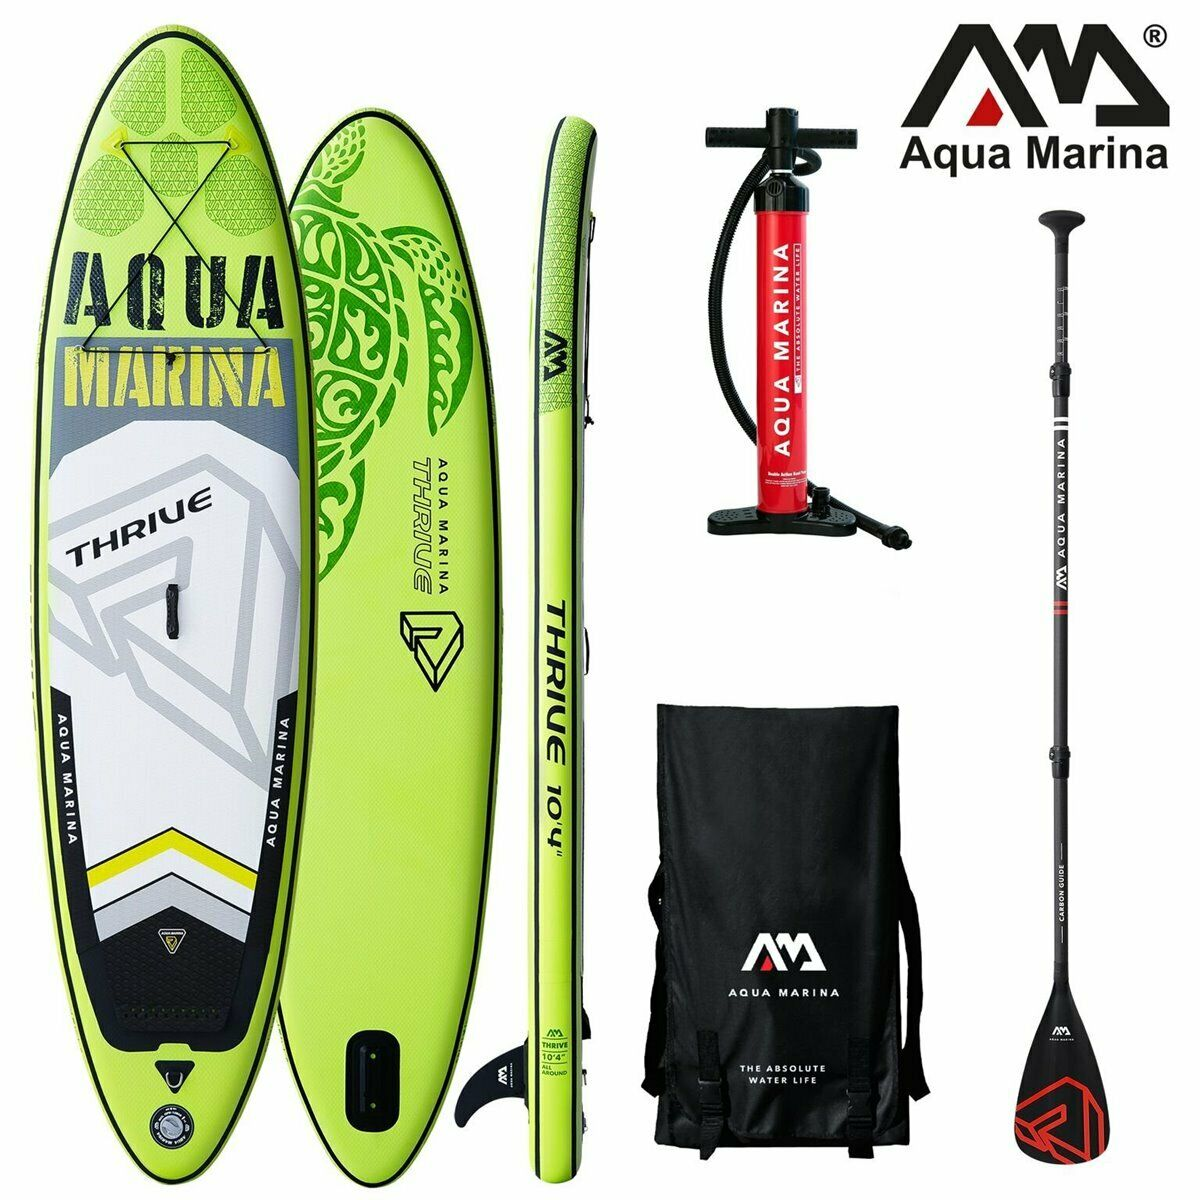 Aqua Marina Thrive Sup Gonfiabile Ste Up Paddle Tavola 150mm Spesso autobonio